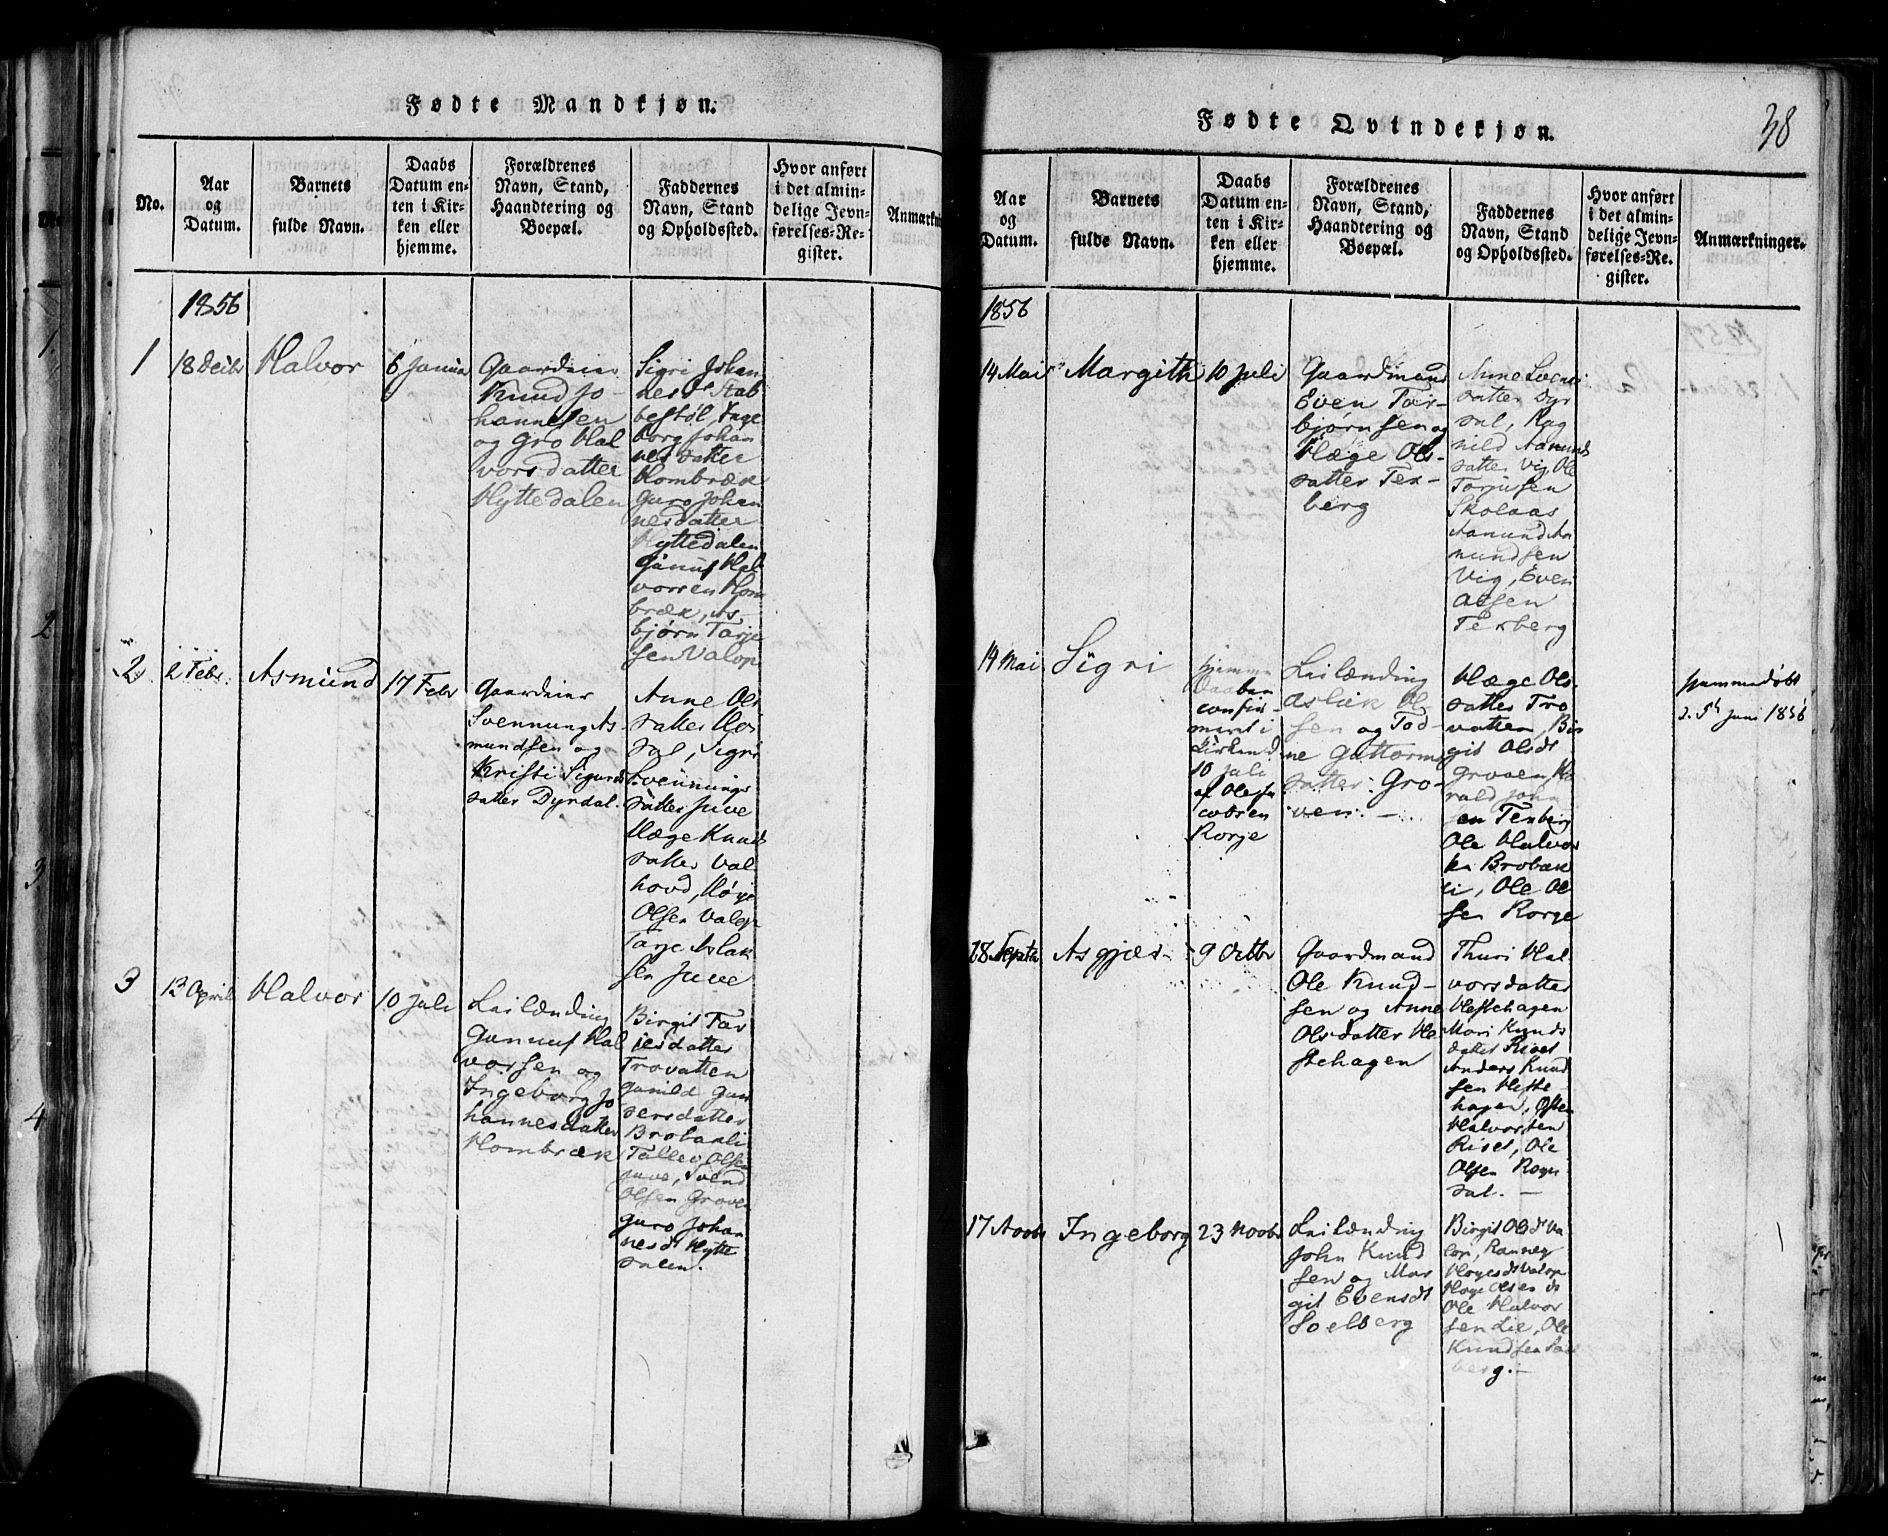 SAKO, Rauland kirkebøker, F/Fa/L0002: Ministerialbok nr. 2, 1815-1860, s. 38